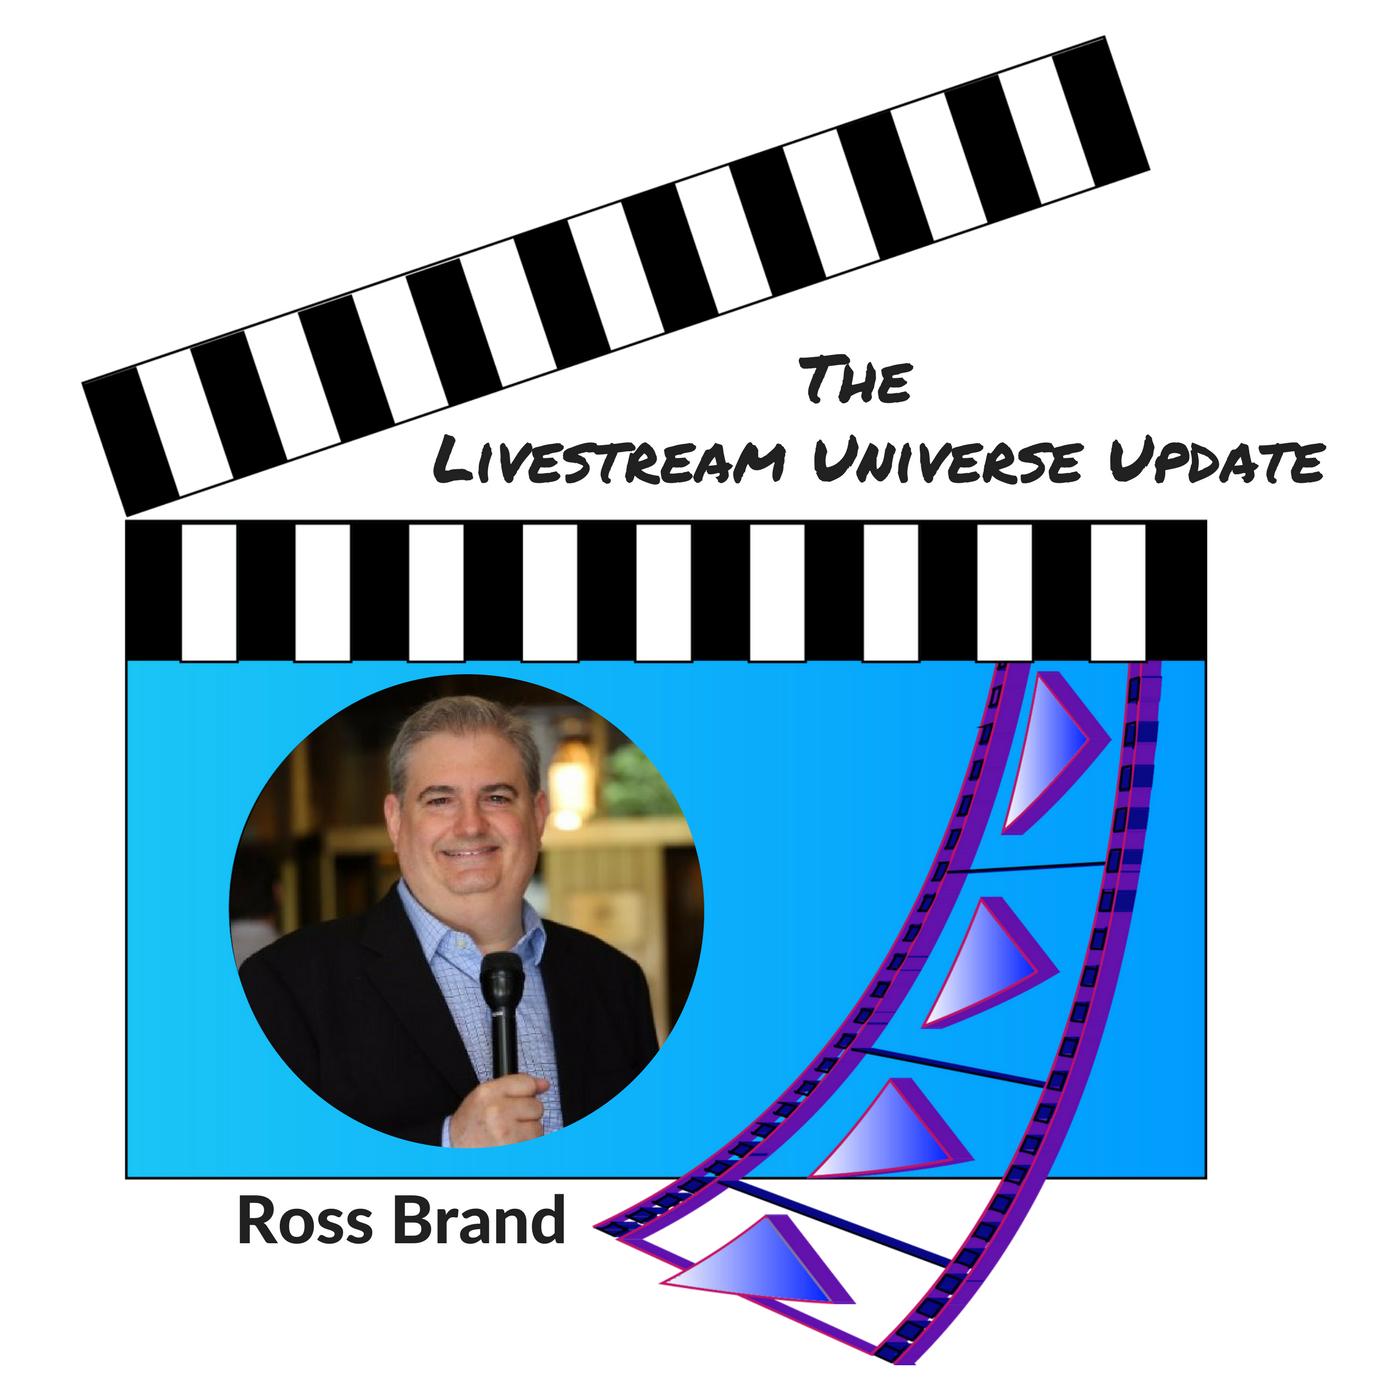 Livestream Universe Update show image